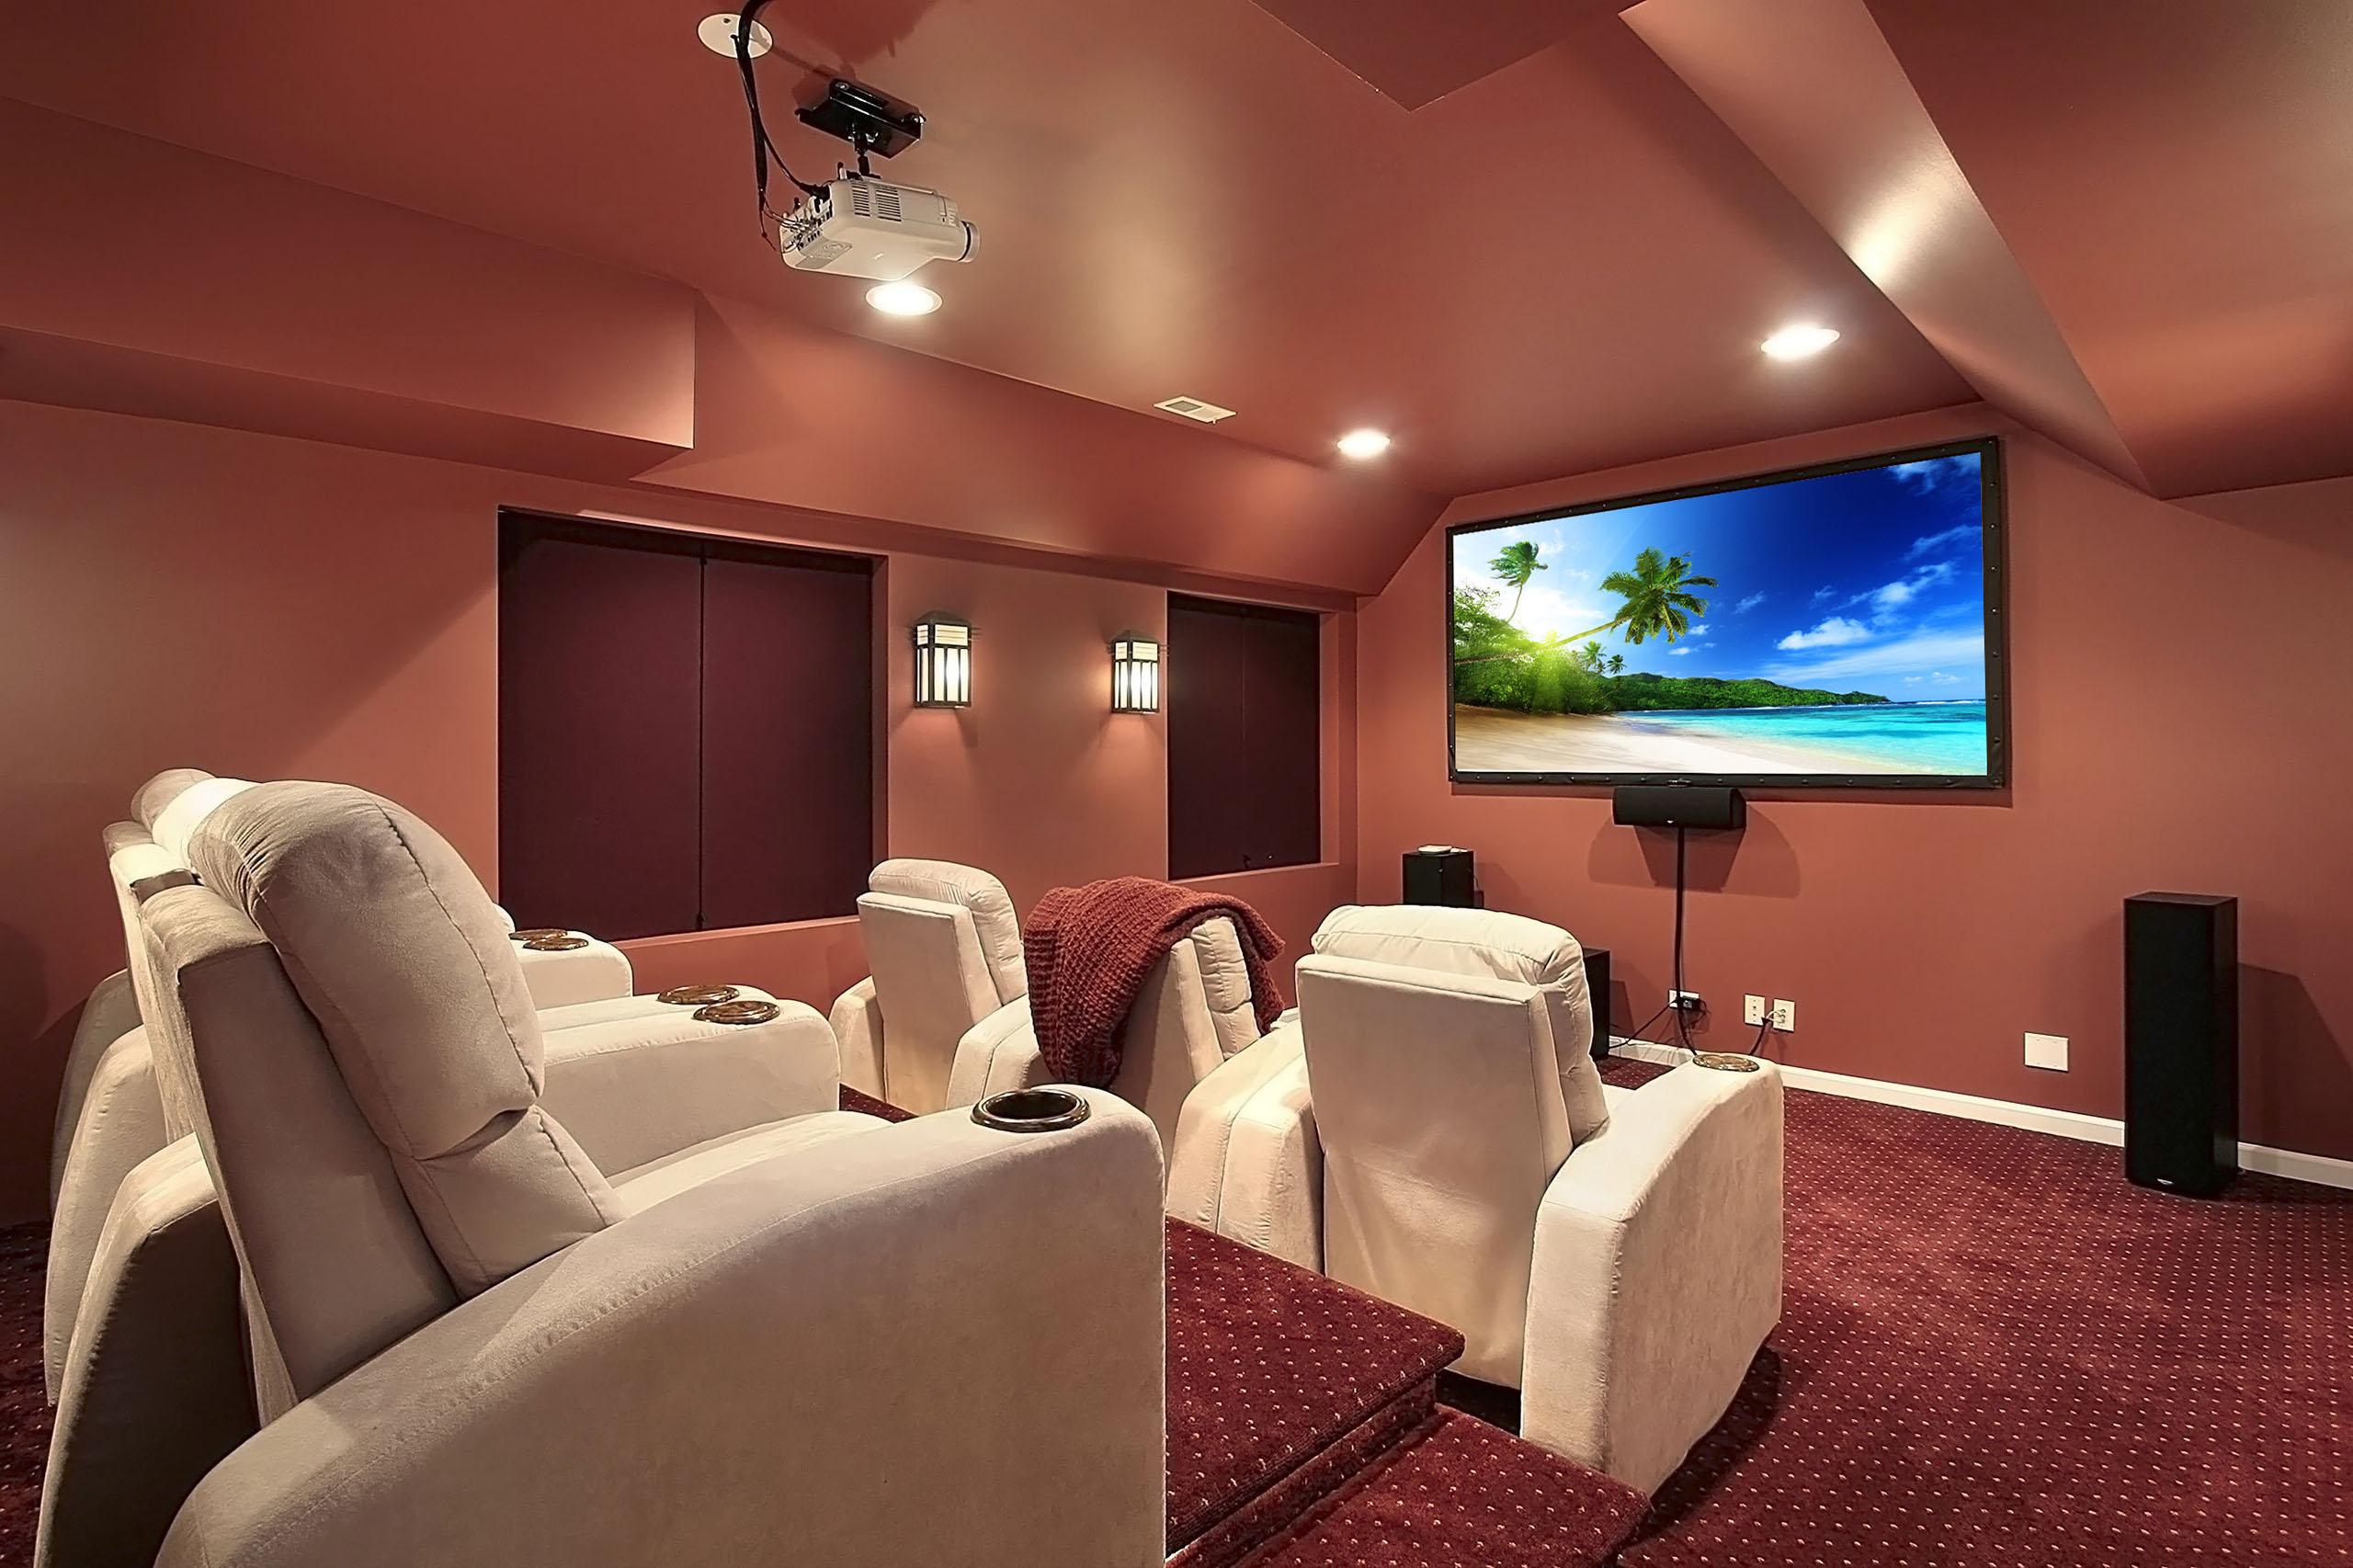 Home Theater Wiring Supplies Solutions Design Theatre Accessories Diagrams Schematics